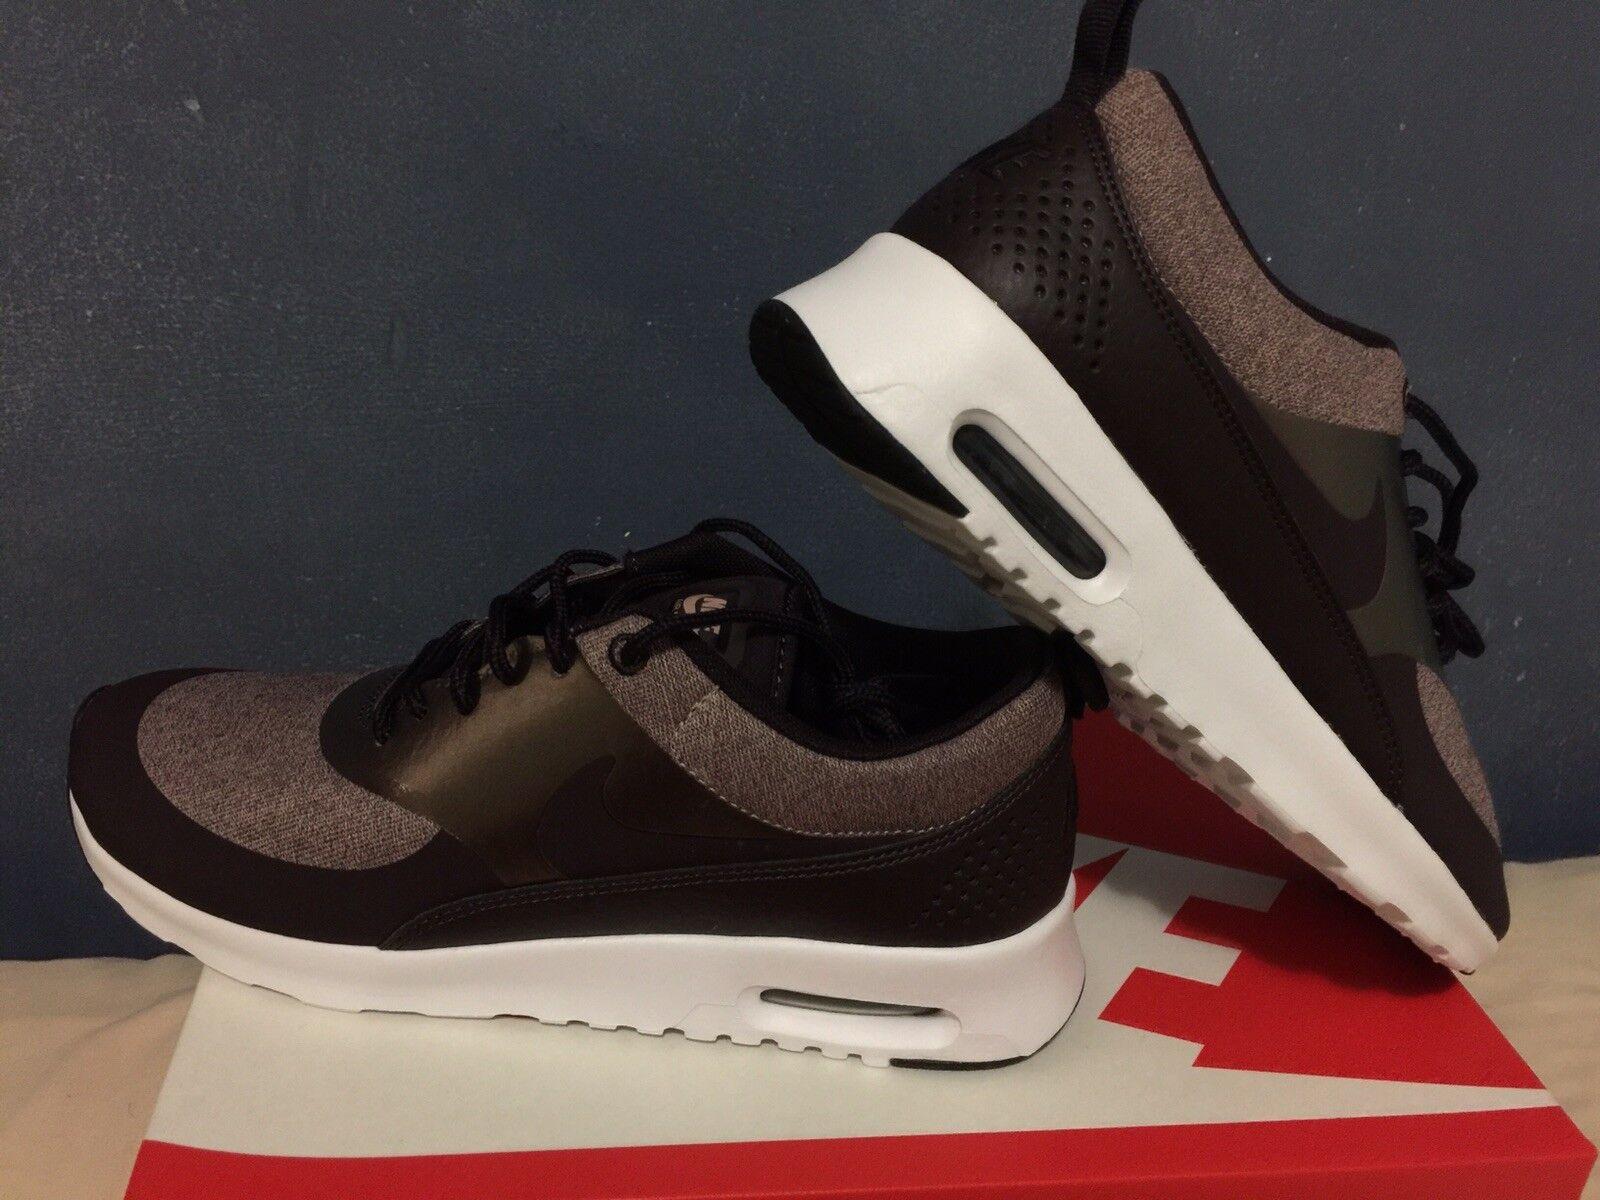 Nike Air Max Thea Metallic Mahogany Wine Running Shoes Women Size 8